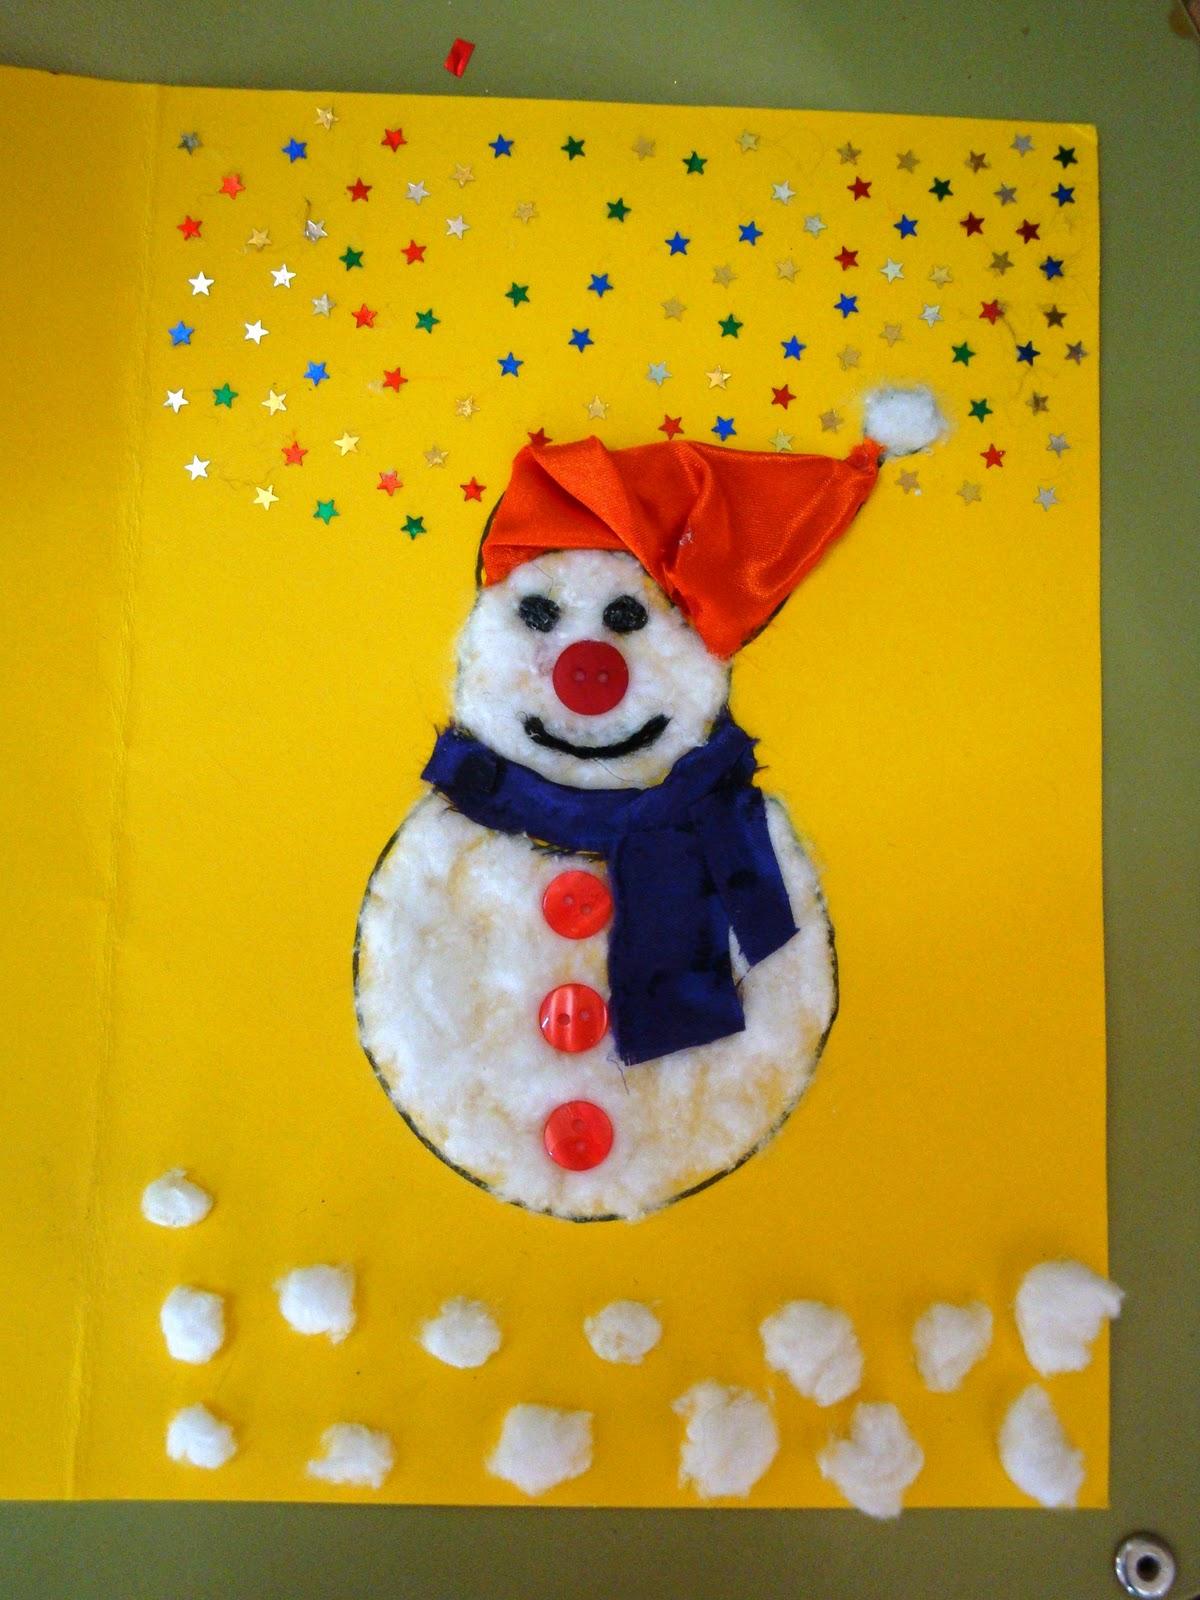 Maestra de infantil tarjetas de navidad hechas por ni os - Tarjetas de navidad de ninos ...